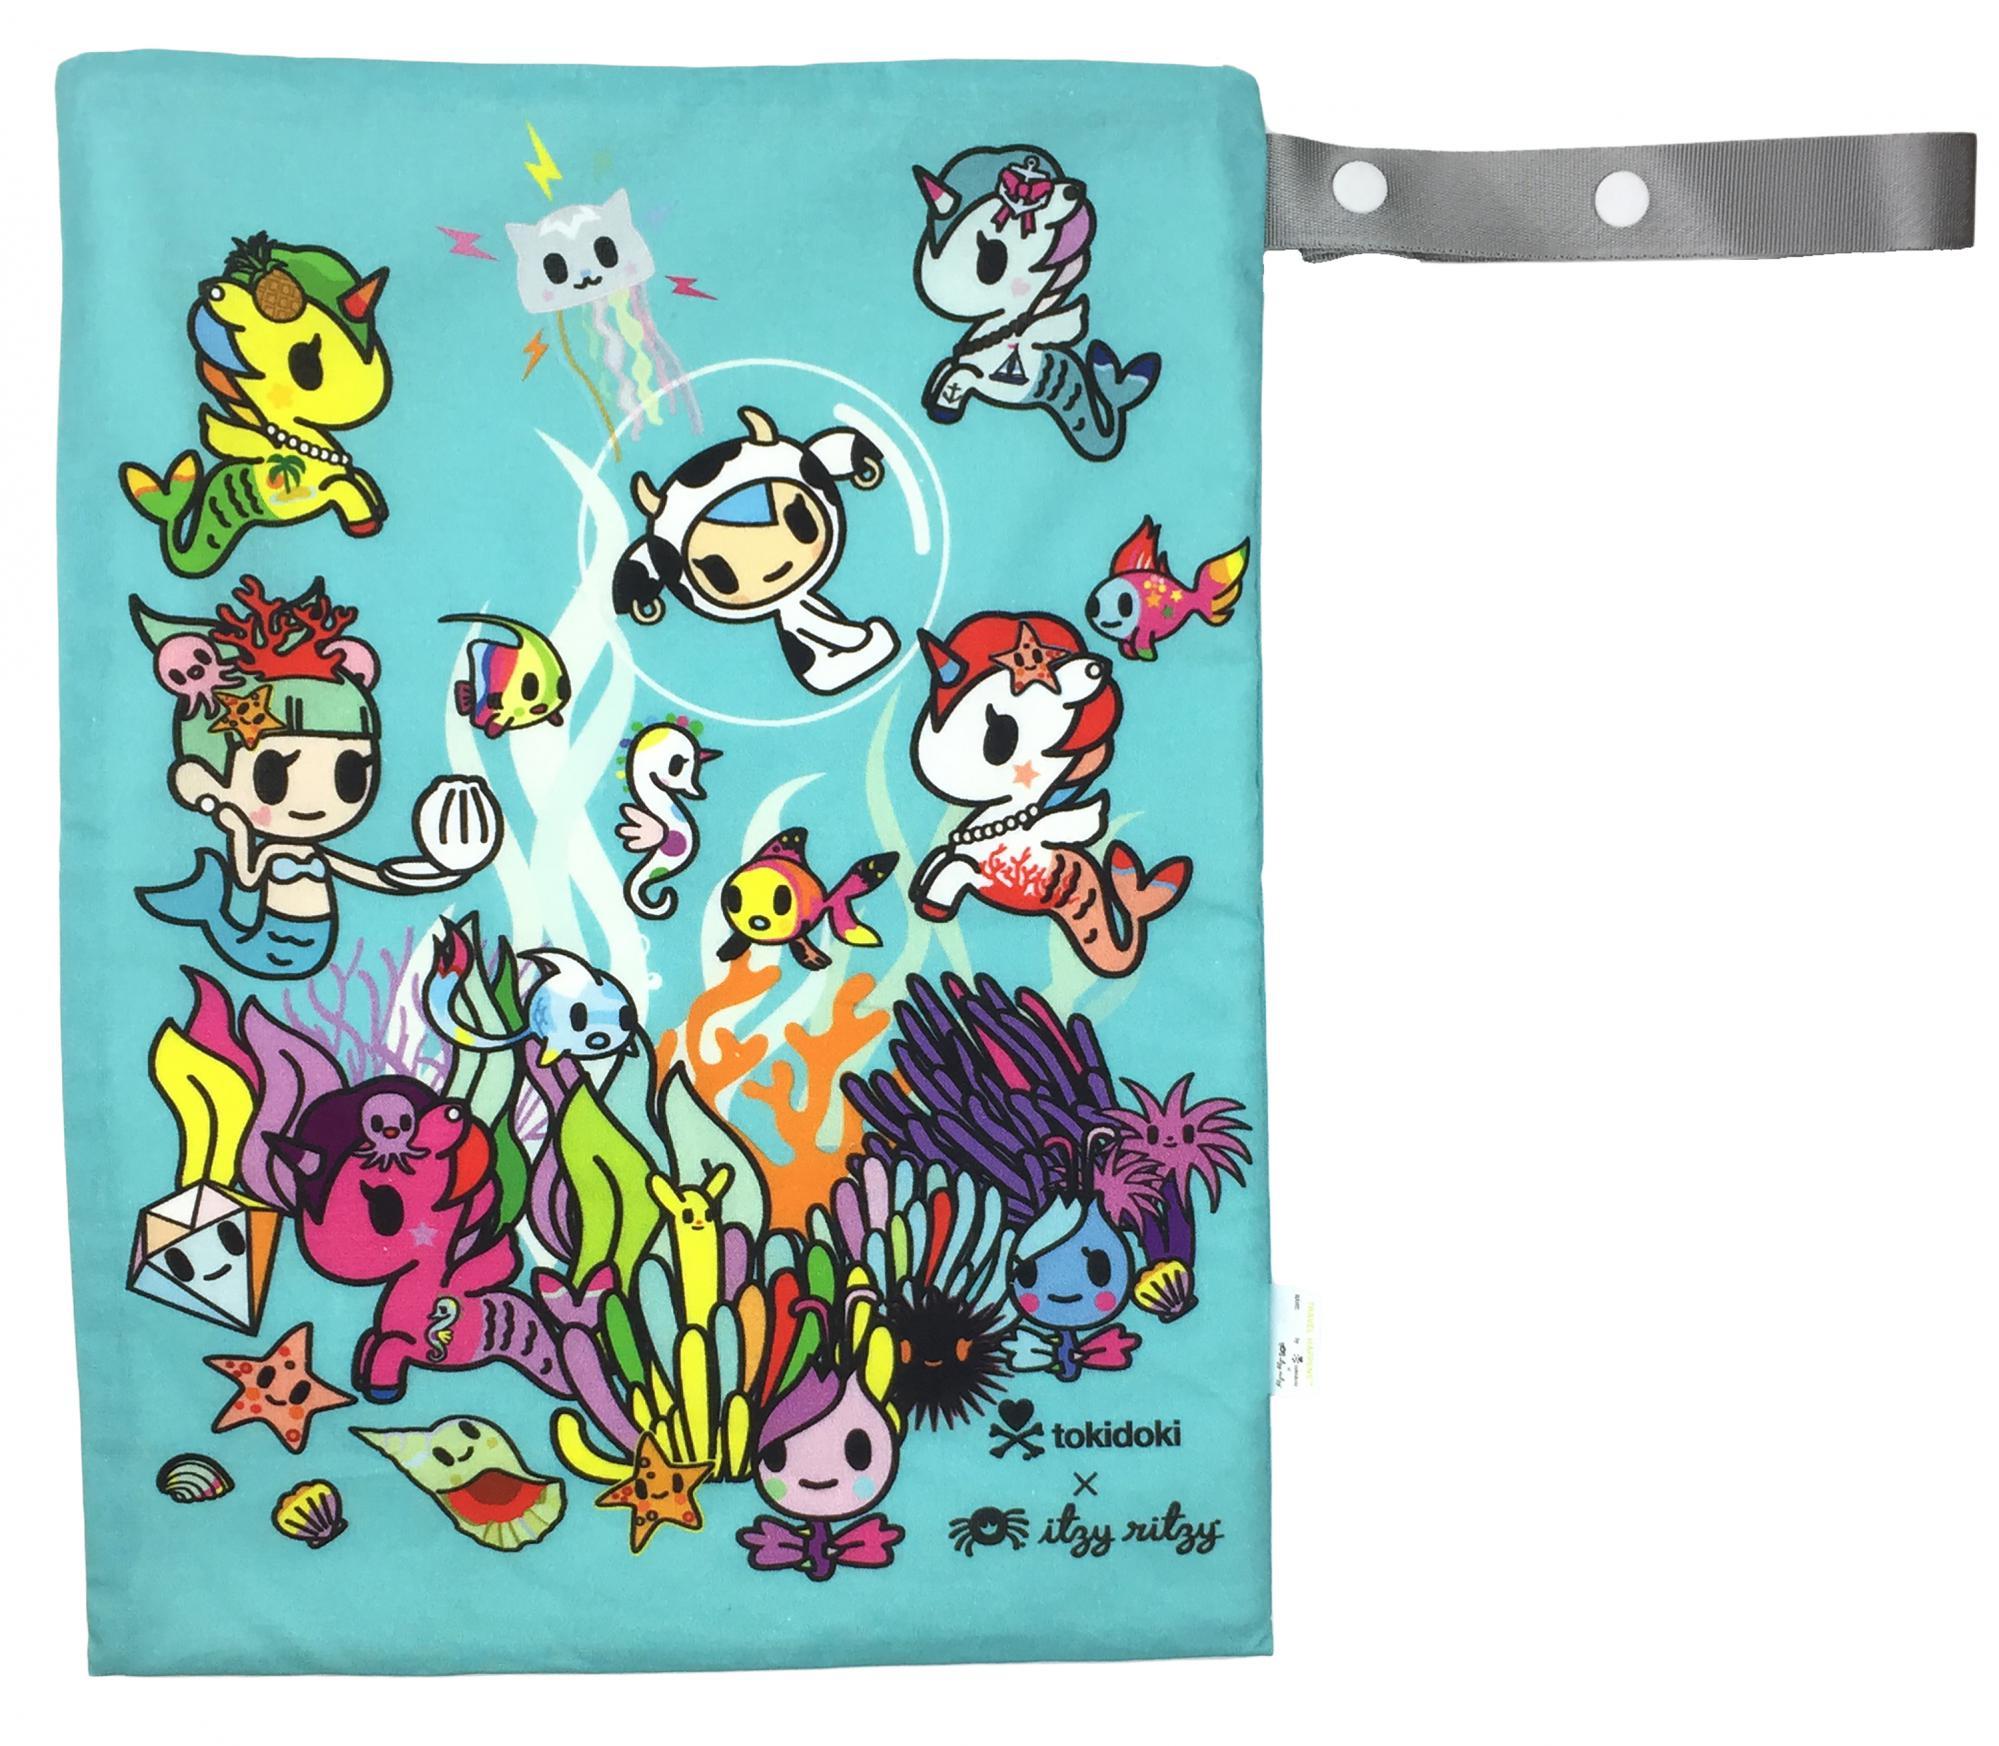 itzy-ritzy-tokidoki-medium-wet-bag-underwater-adventure.jpg